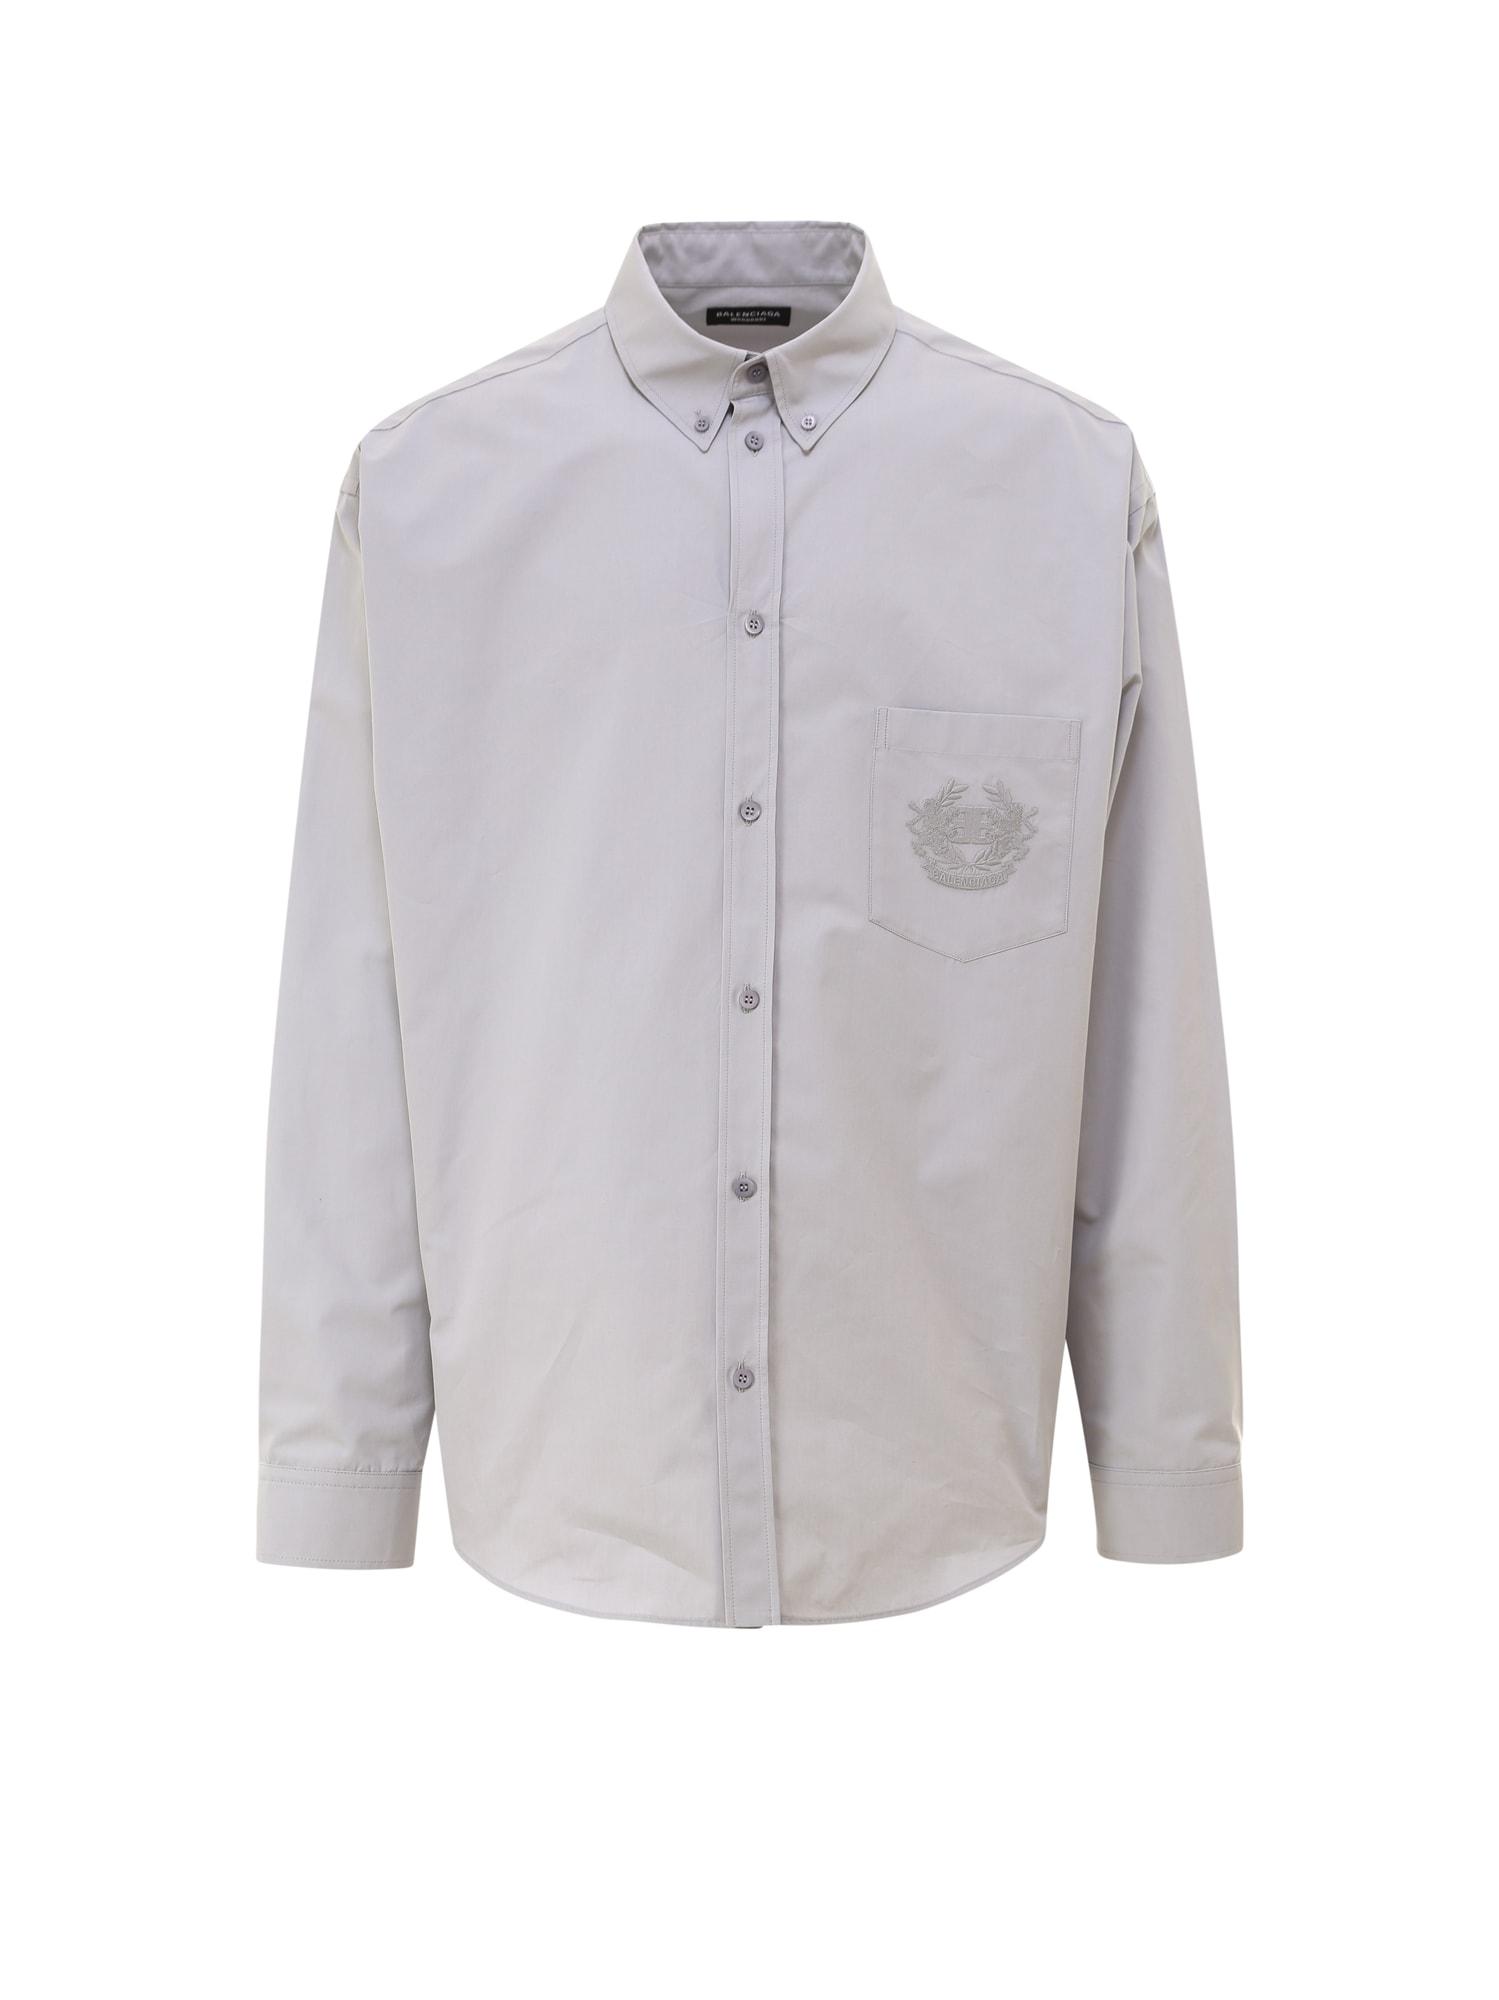 Balenciaga Shirts SHIRT